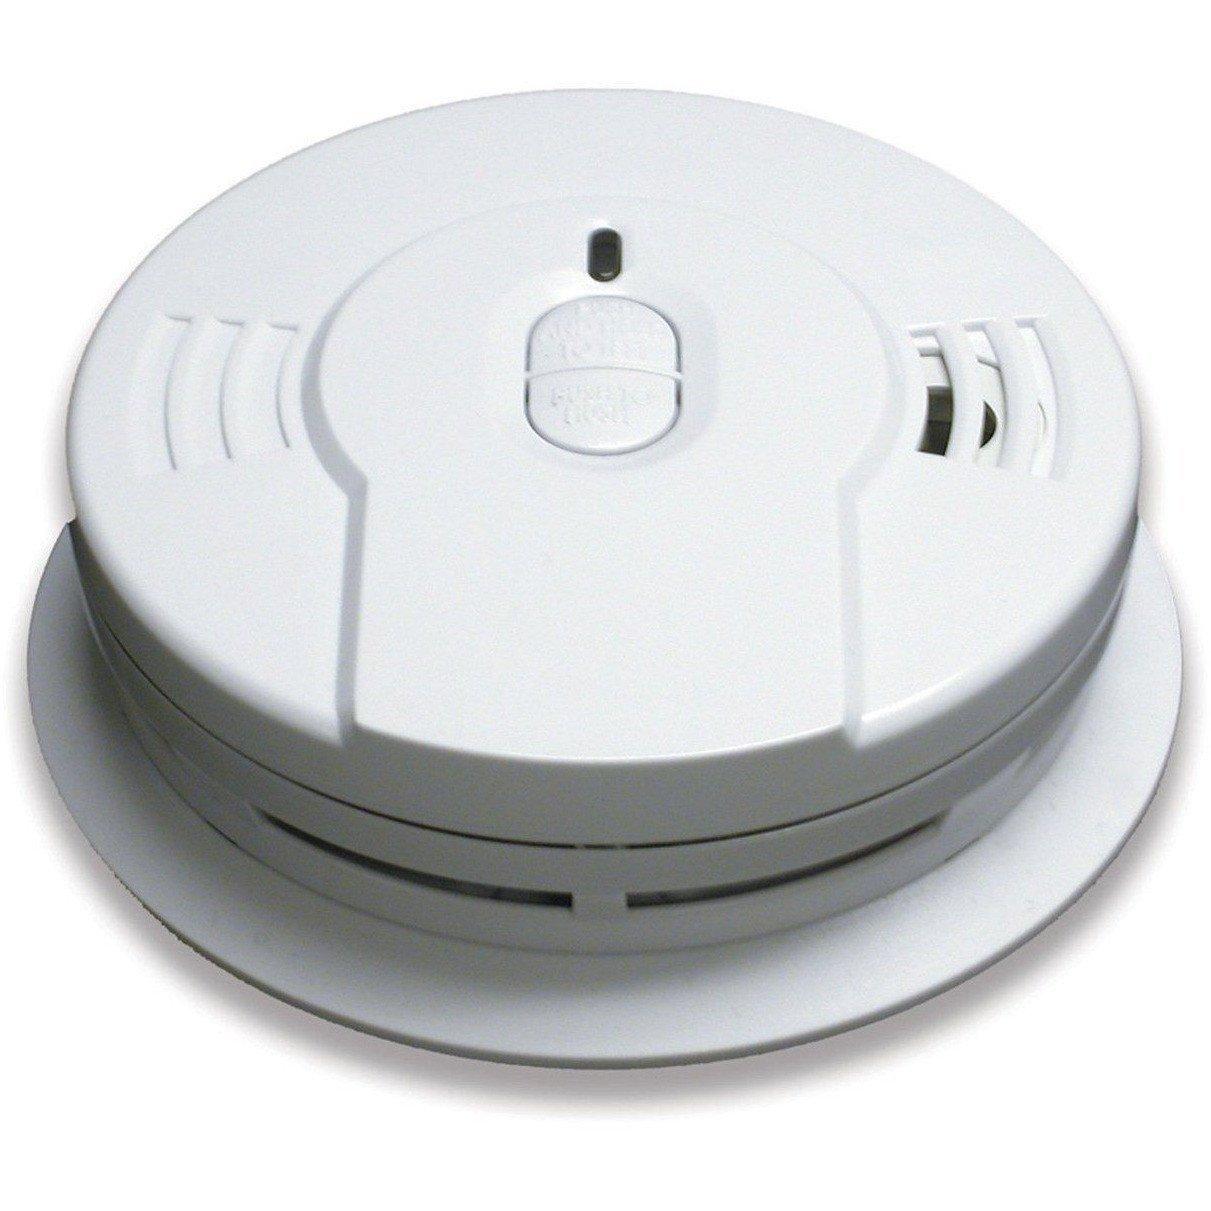 Kidde I9010 Smoke Detector 3v 10 Year Sealed Lithium Battery Powered W Memory Smart Hush Smoke Alarms Best Waterproof Camera Hush Hush